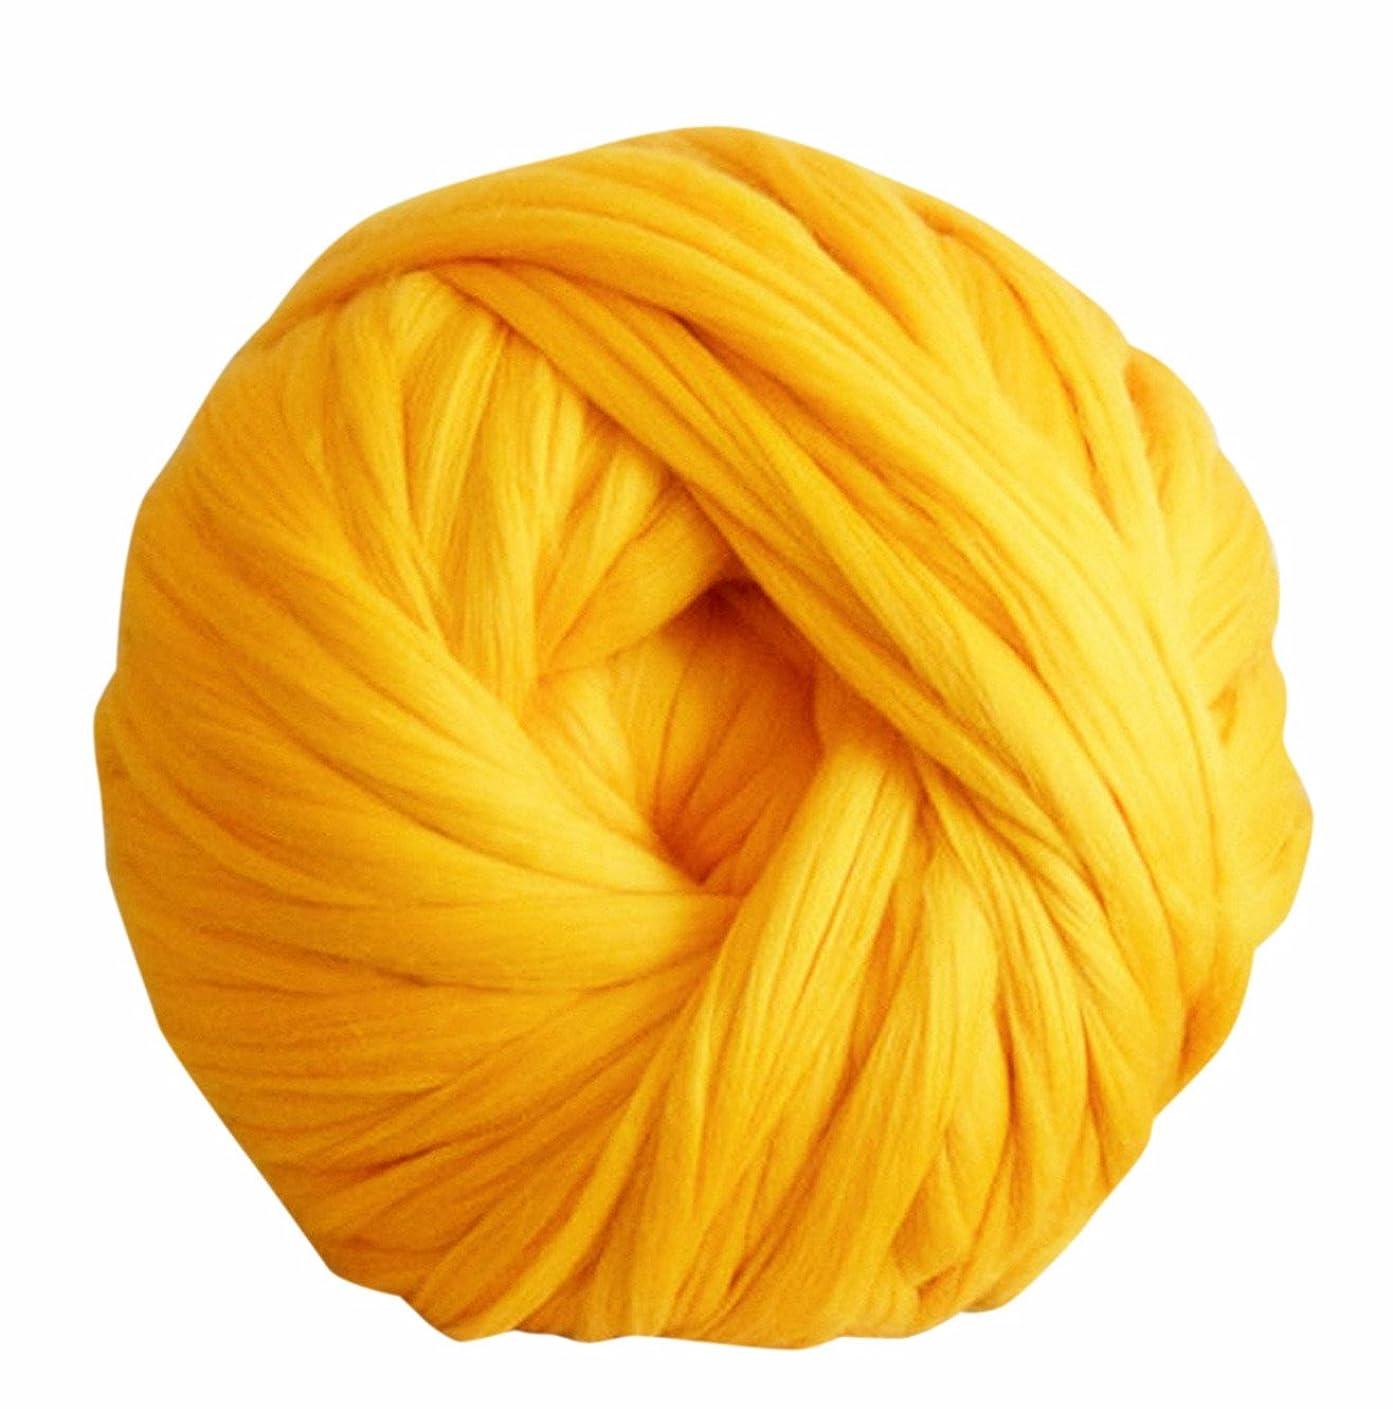 Giant Yarn Chunky Knit Yarn Wool Yarn Extreme Arm Knitting Colors 1 kg(2.2 lbs) Chunky Wool (Yellow)